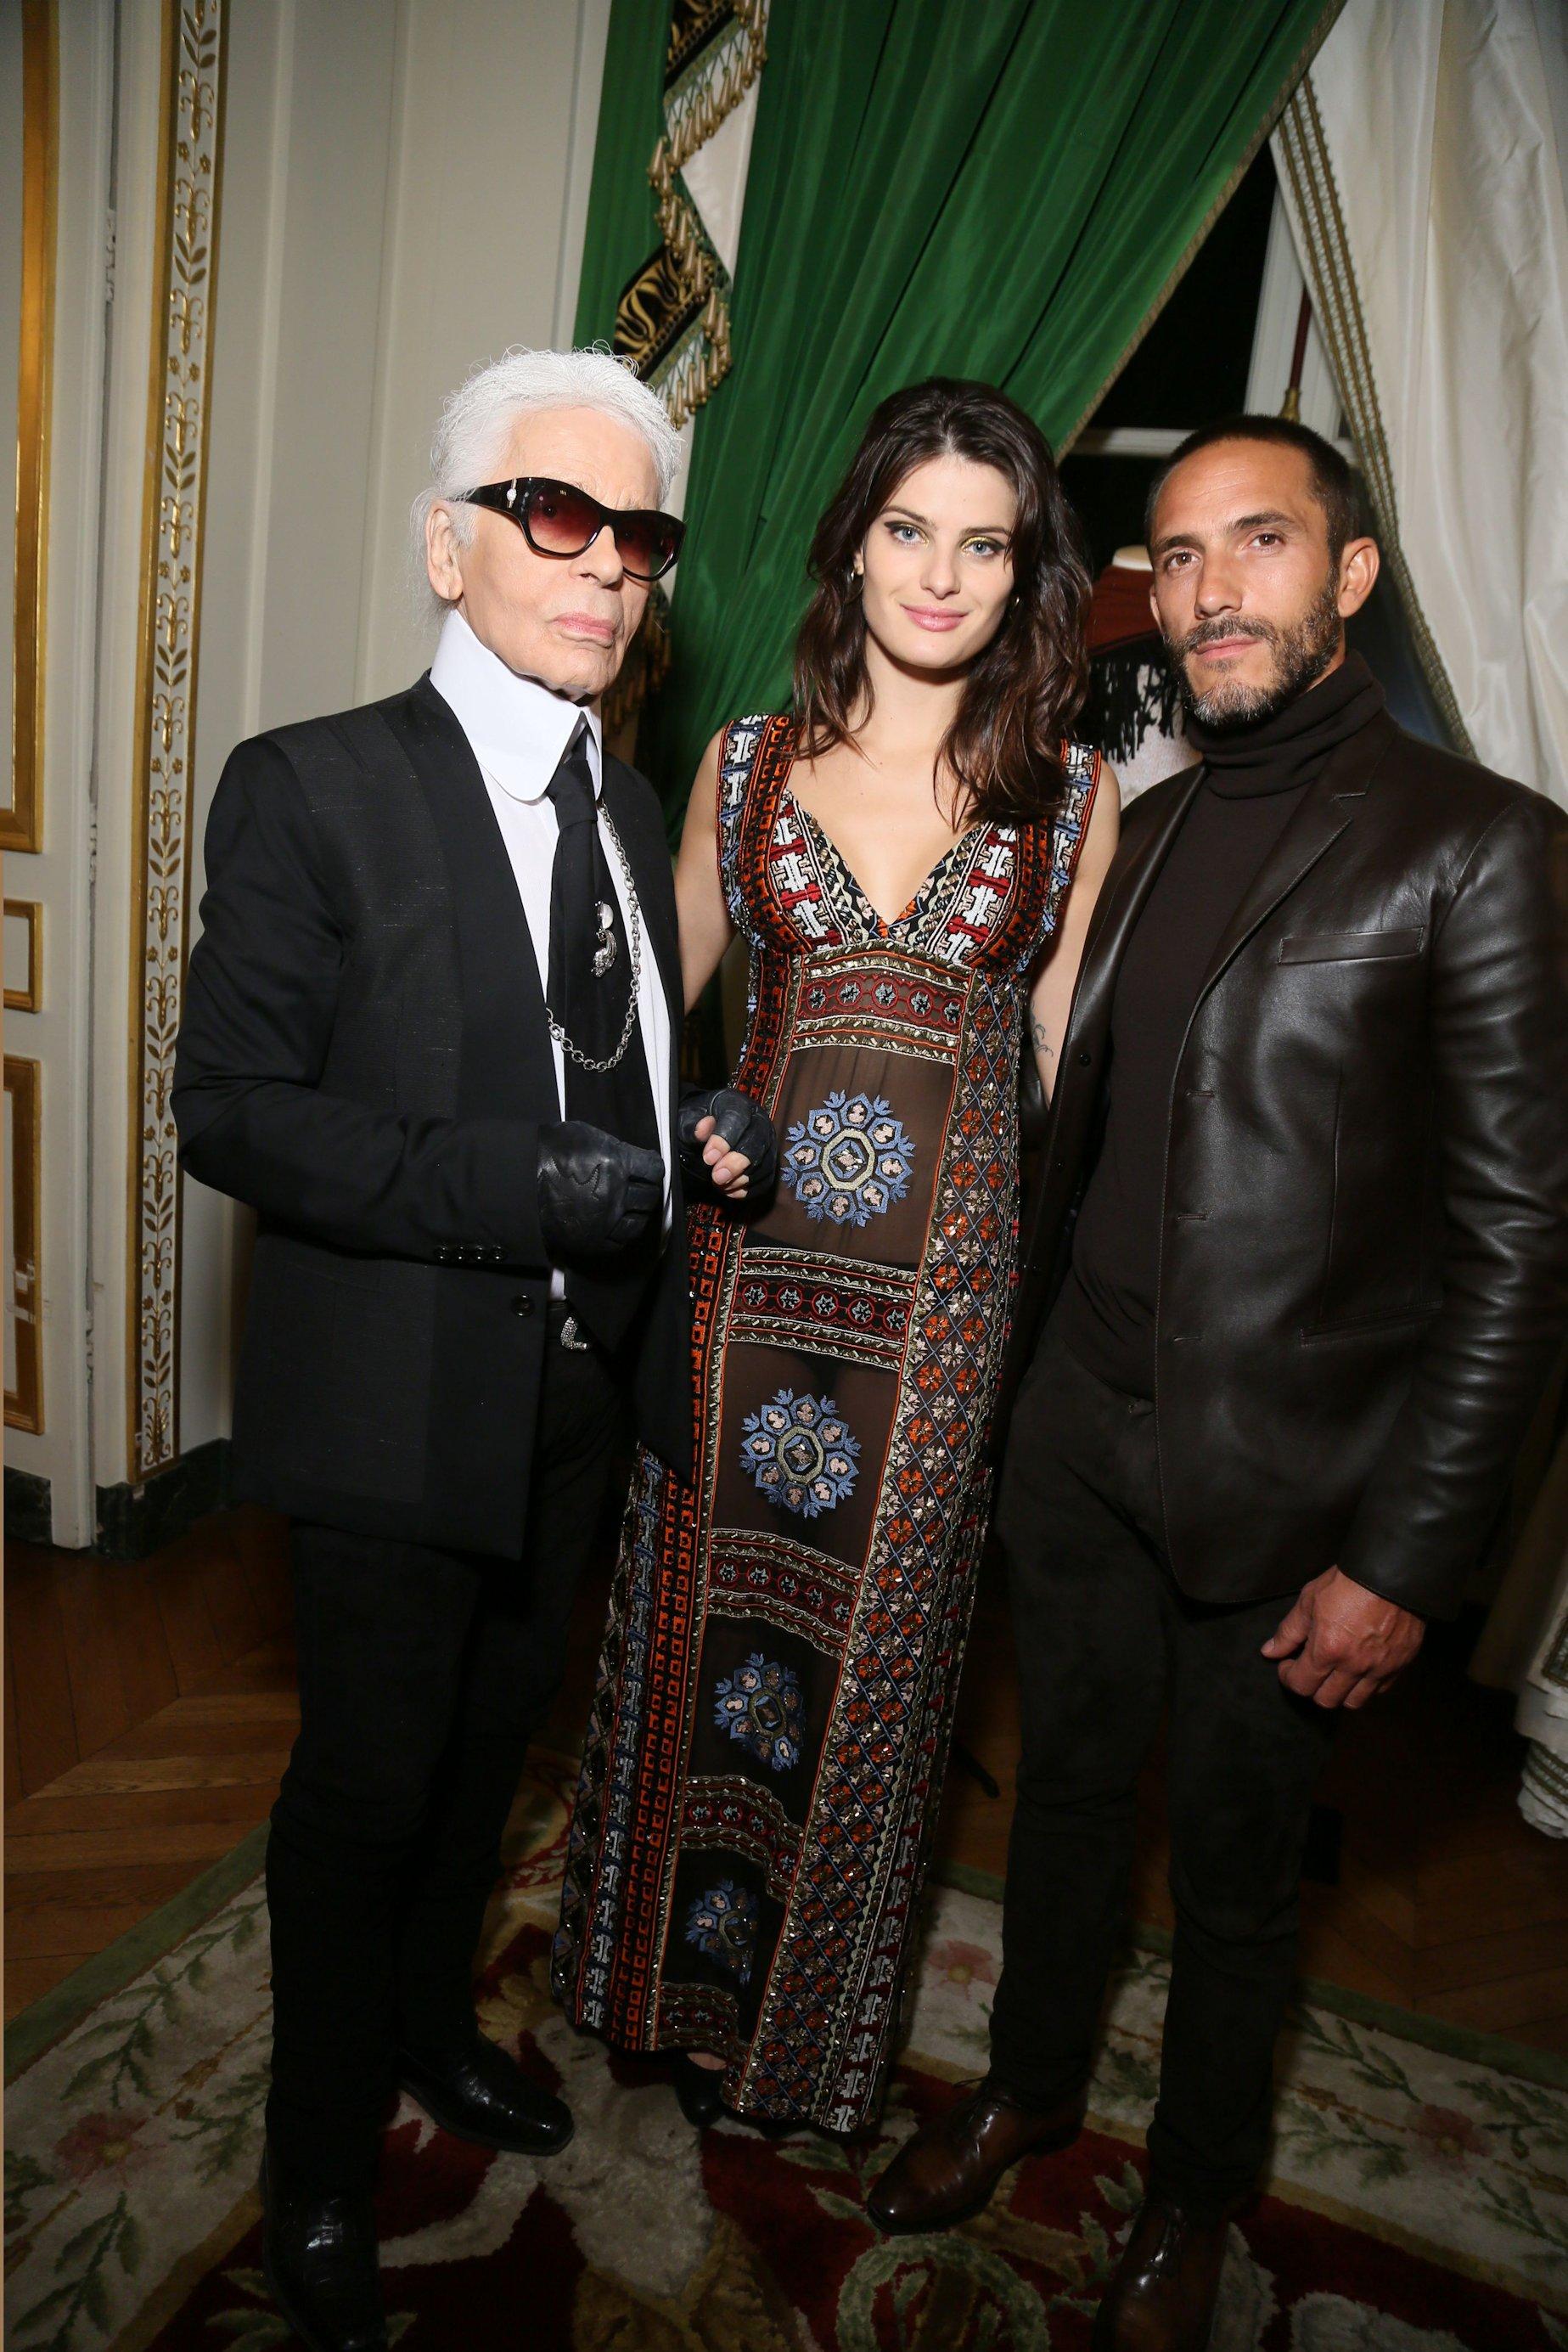 Karl Lagerfeld, Isabeli Fontana and Sebastien Jondeau attend Der Berliner Mode Salon